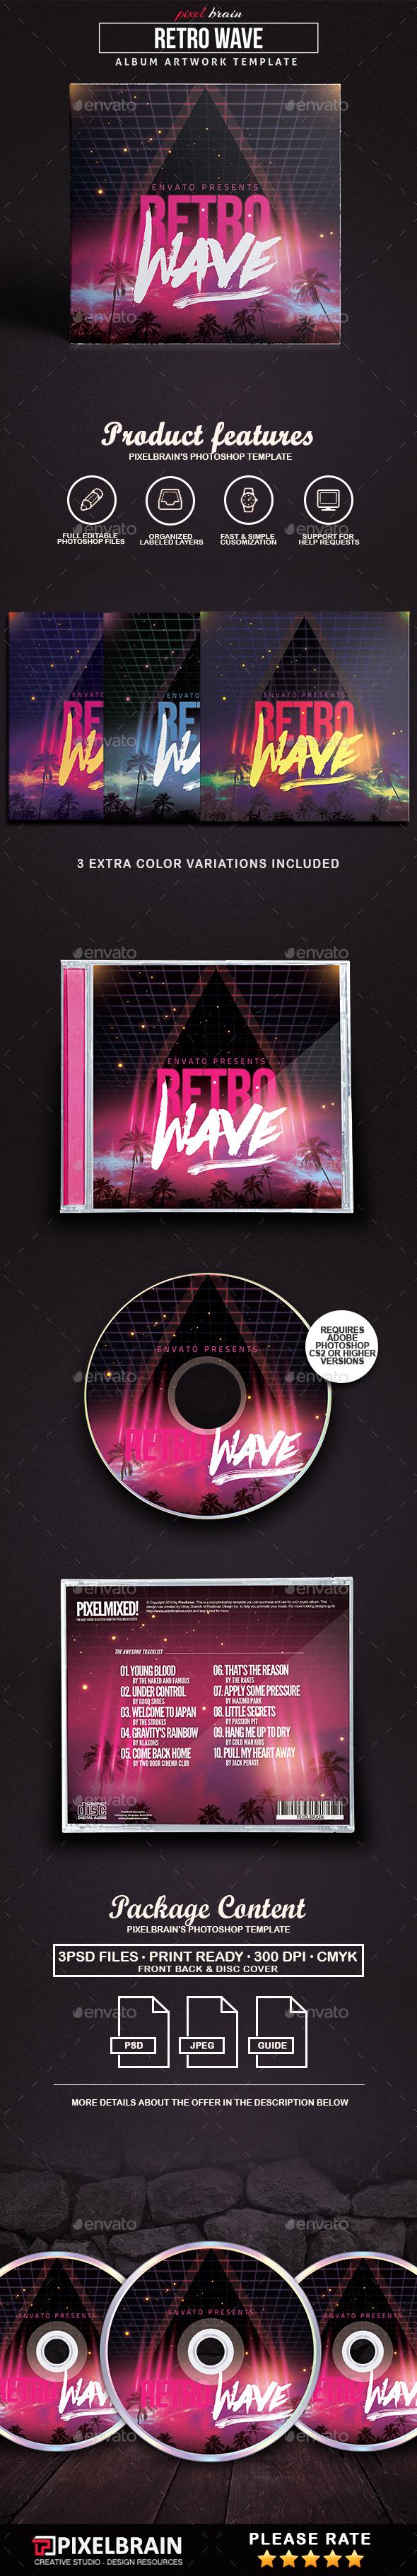 Retro Wave CD Cover Artwork - CD & DVD Artwork Print Templates